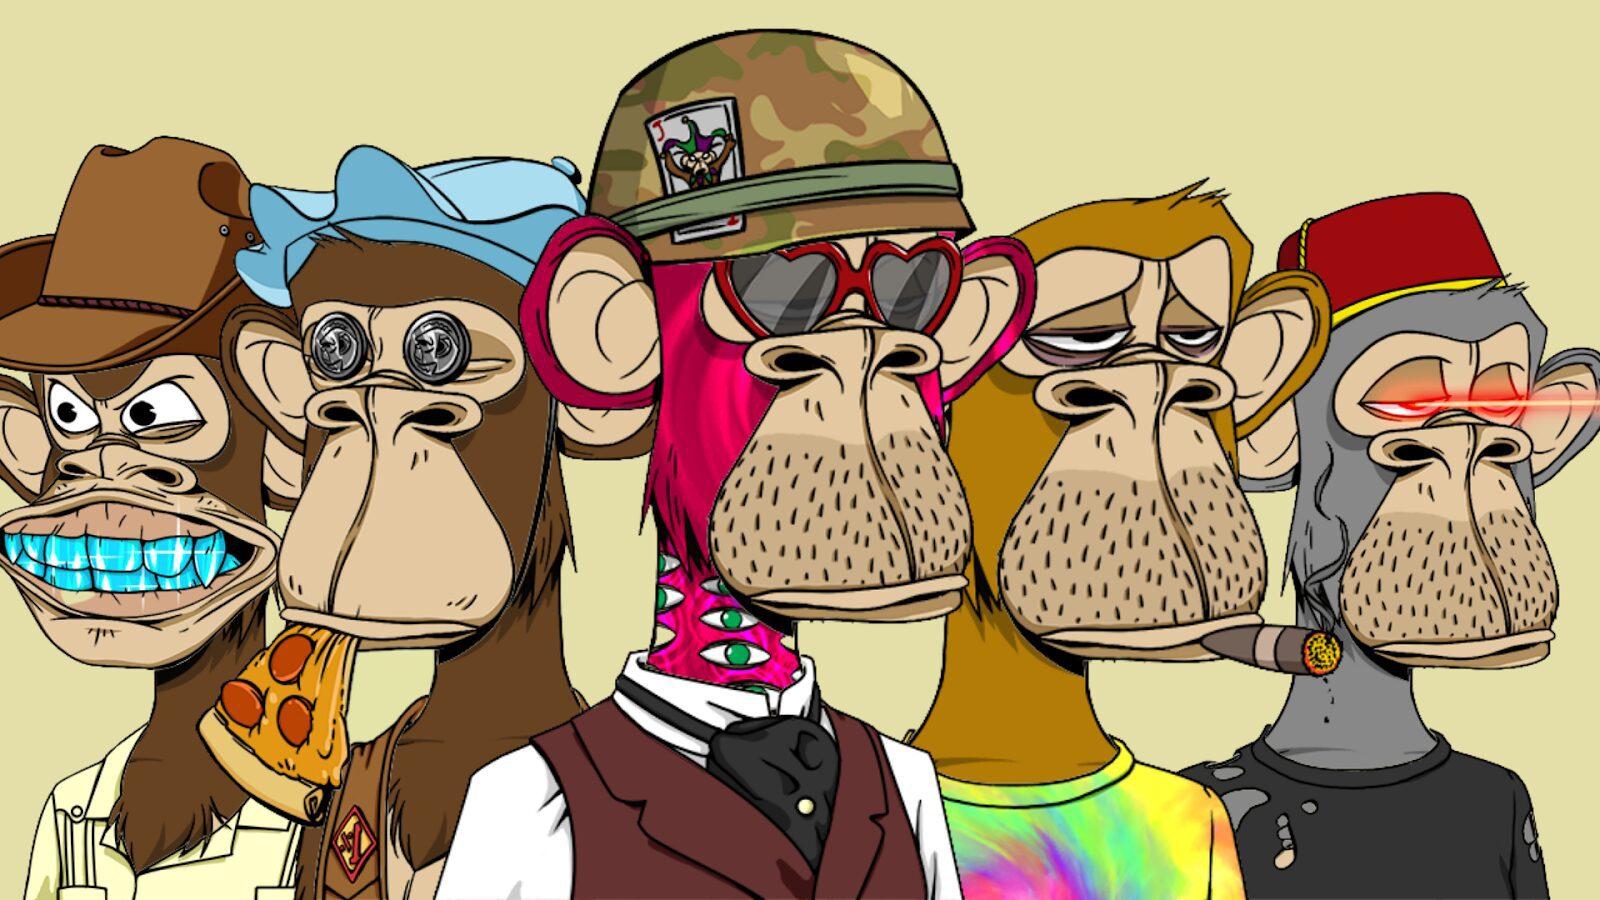 monos mutantes